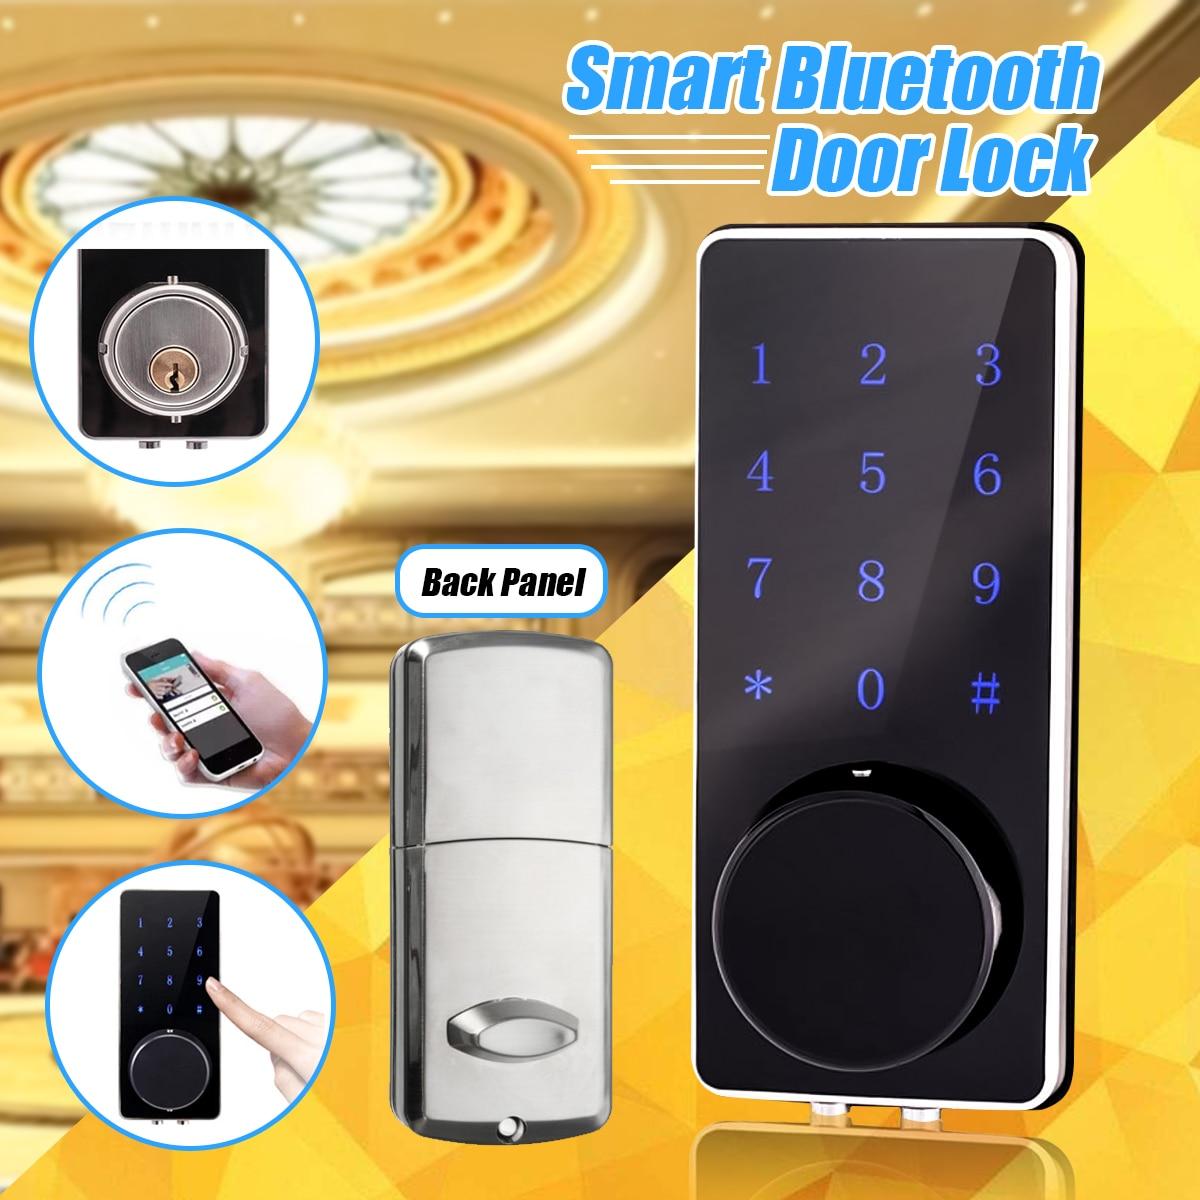 все цены на NEW Electronic Bluetooth Smartcode Digital Door Lock Keyless Touch Password Deadbolt For Hotel and Apartment онлайн